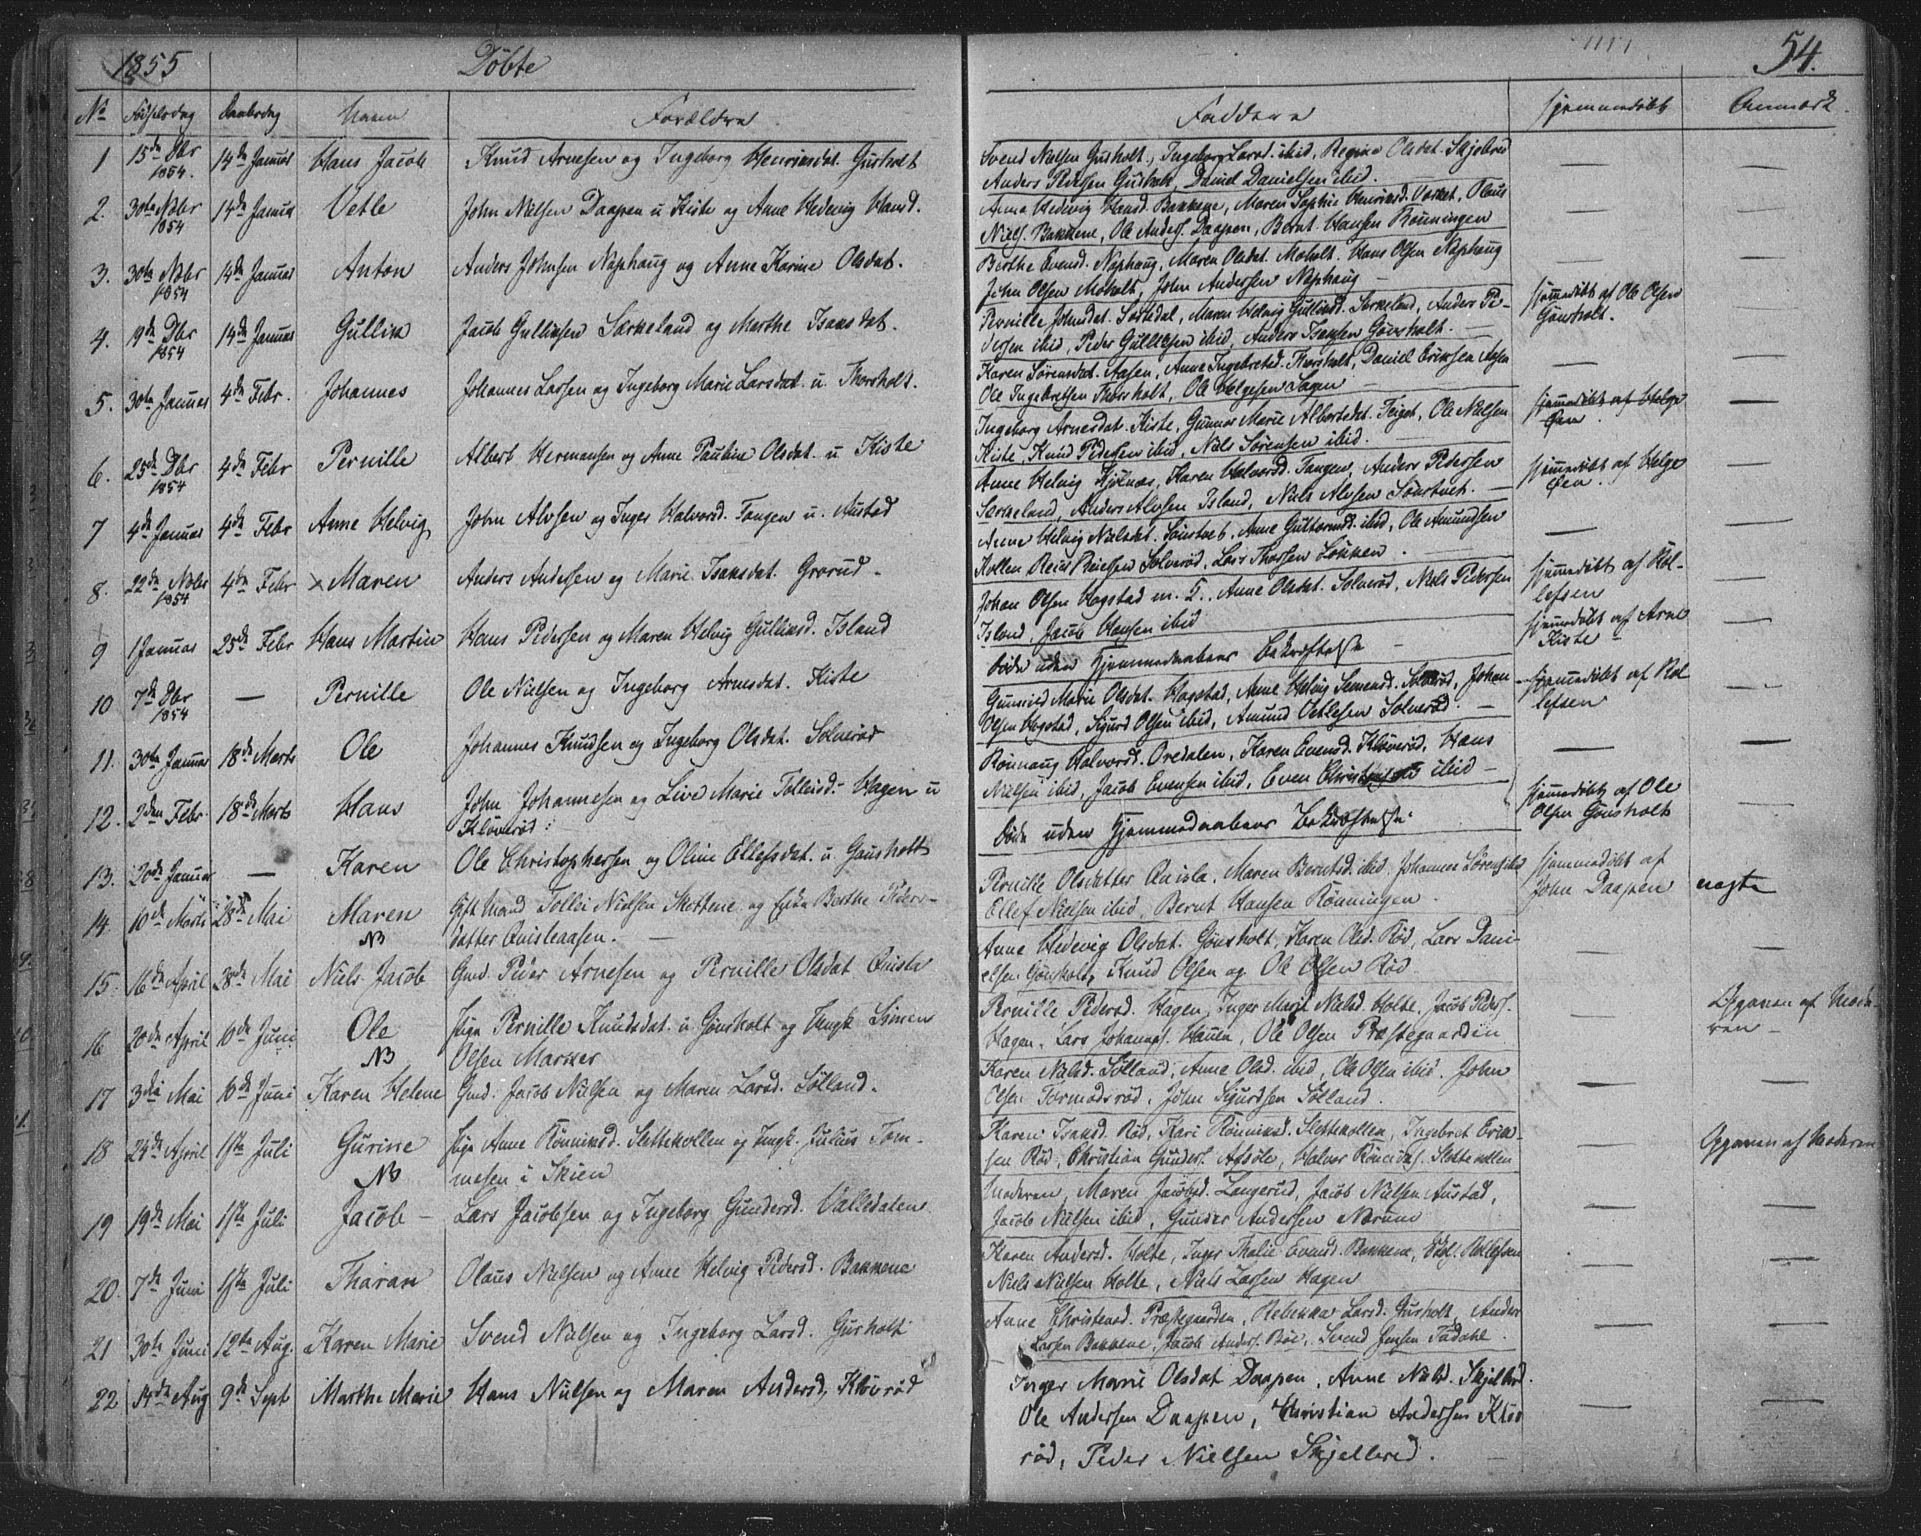 SAKO, Siljan kirkebøker, F/Fa/L0001: Parish register (official) no. 1, 1831-1870, p. 54